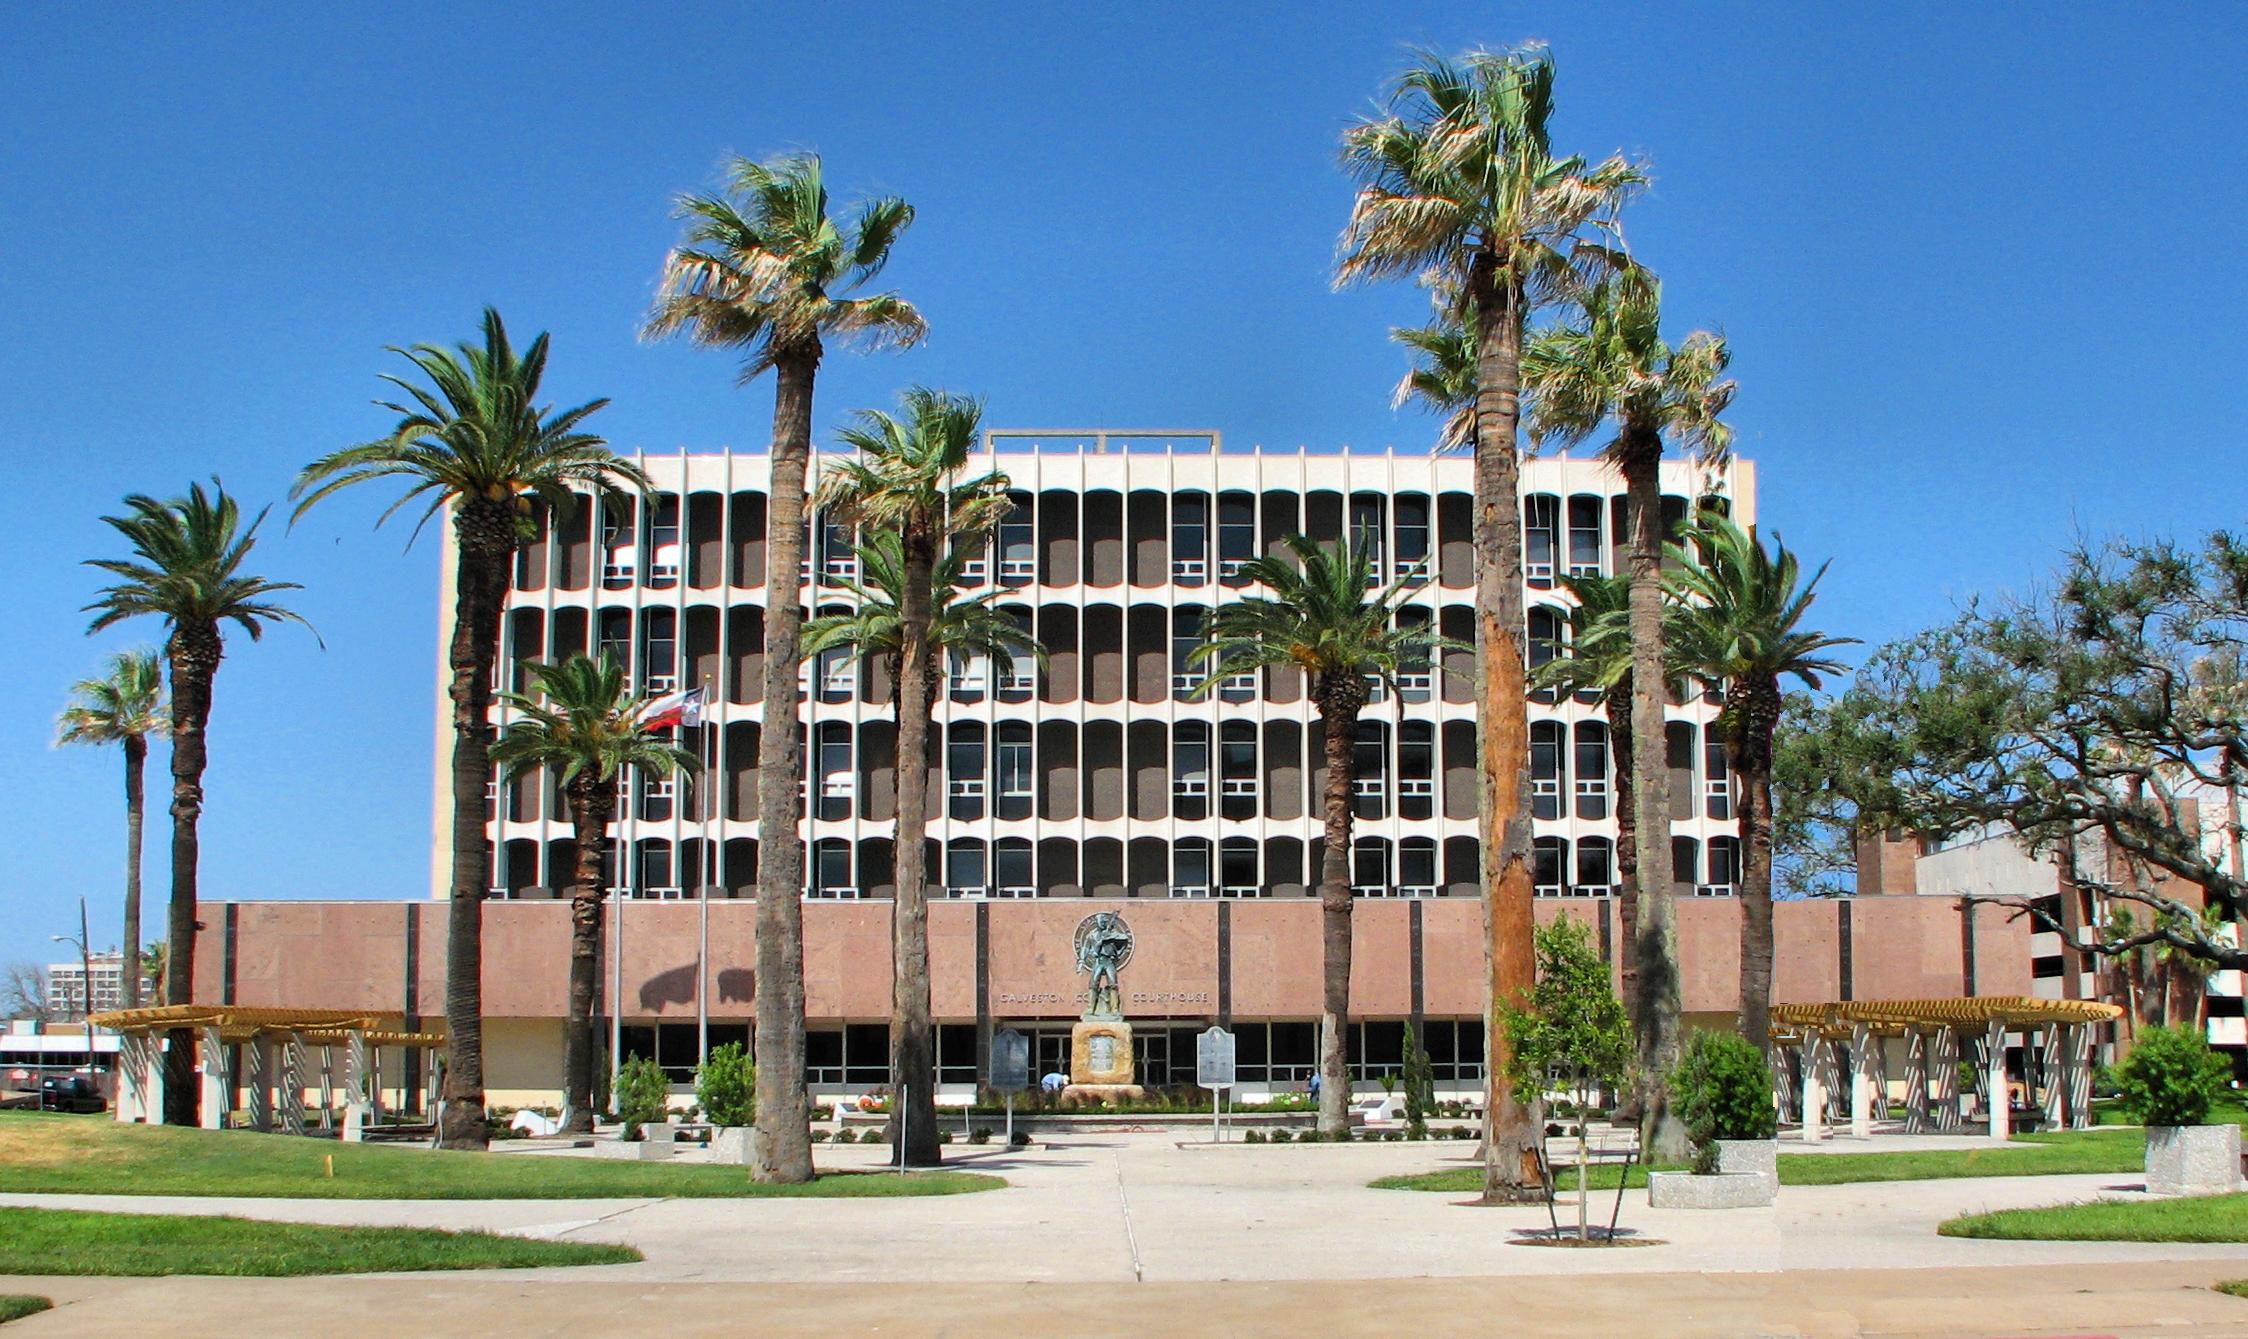 Galveston_Civil_Courthouse.jpg